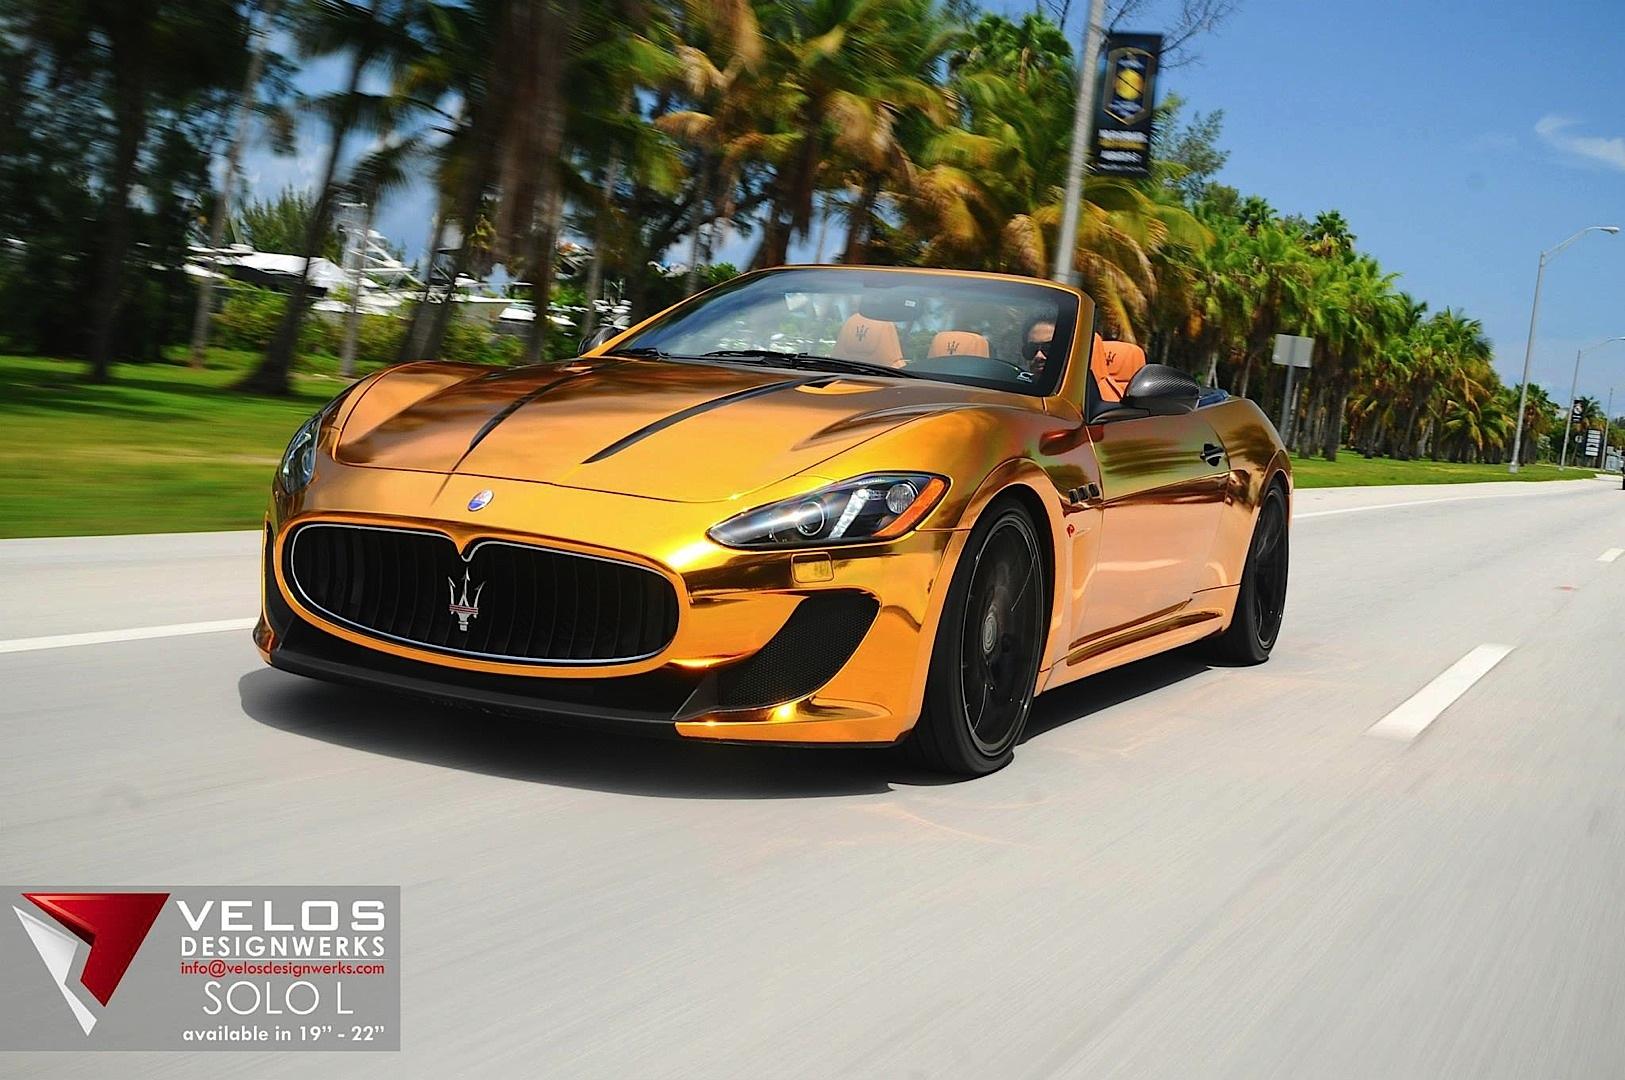 Maserati Grancabrio Gold From Velos Designwerks